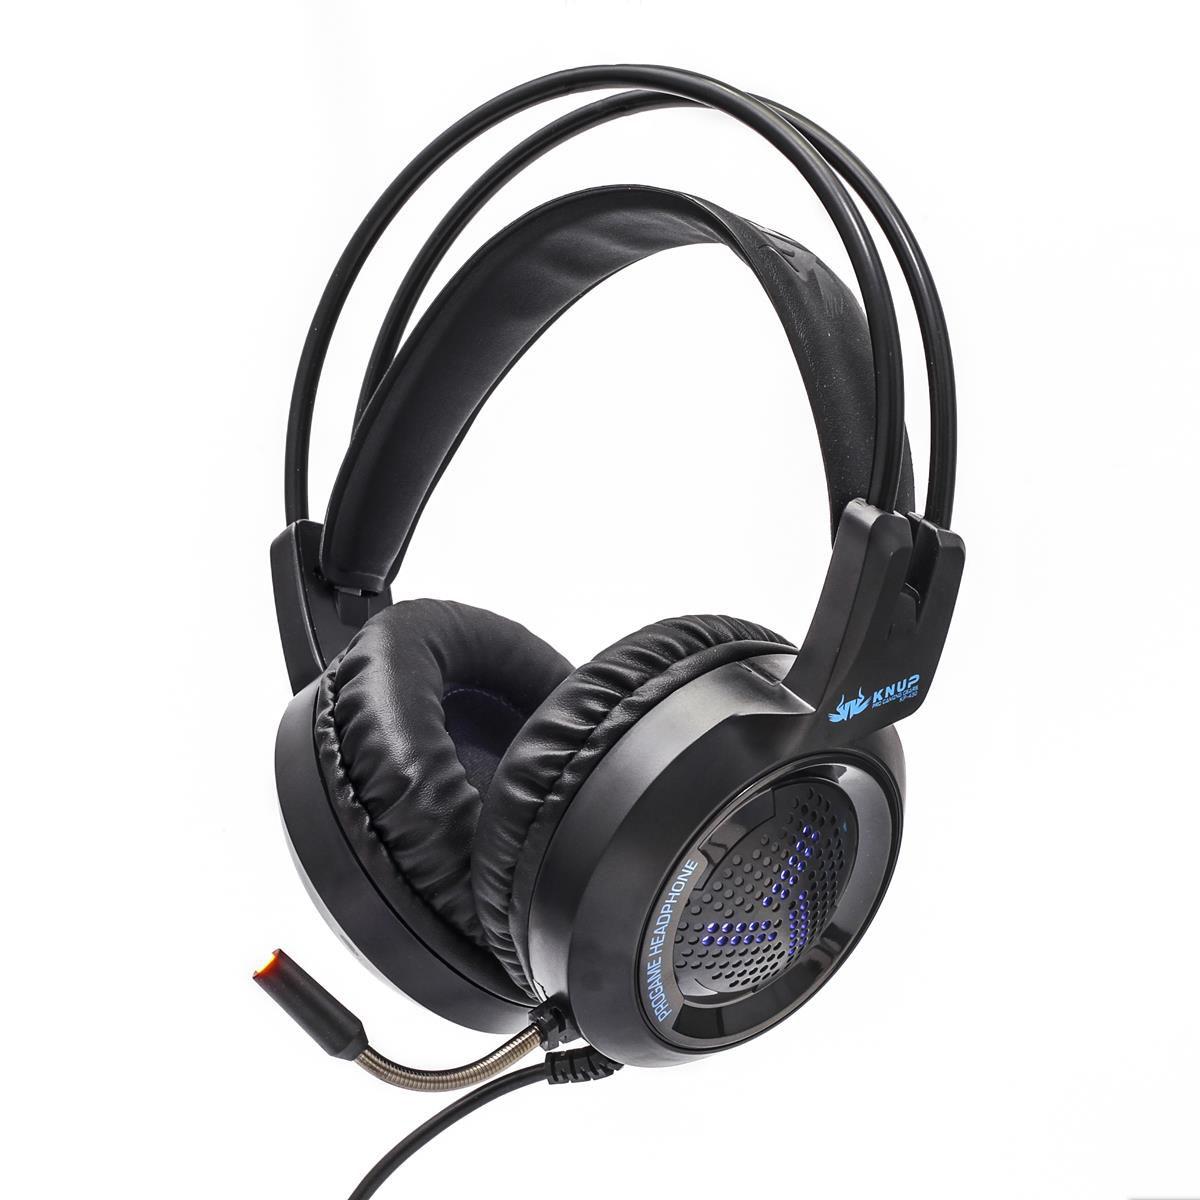 Headset Gamer com Microfone e LEDs Knup KP-430